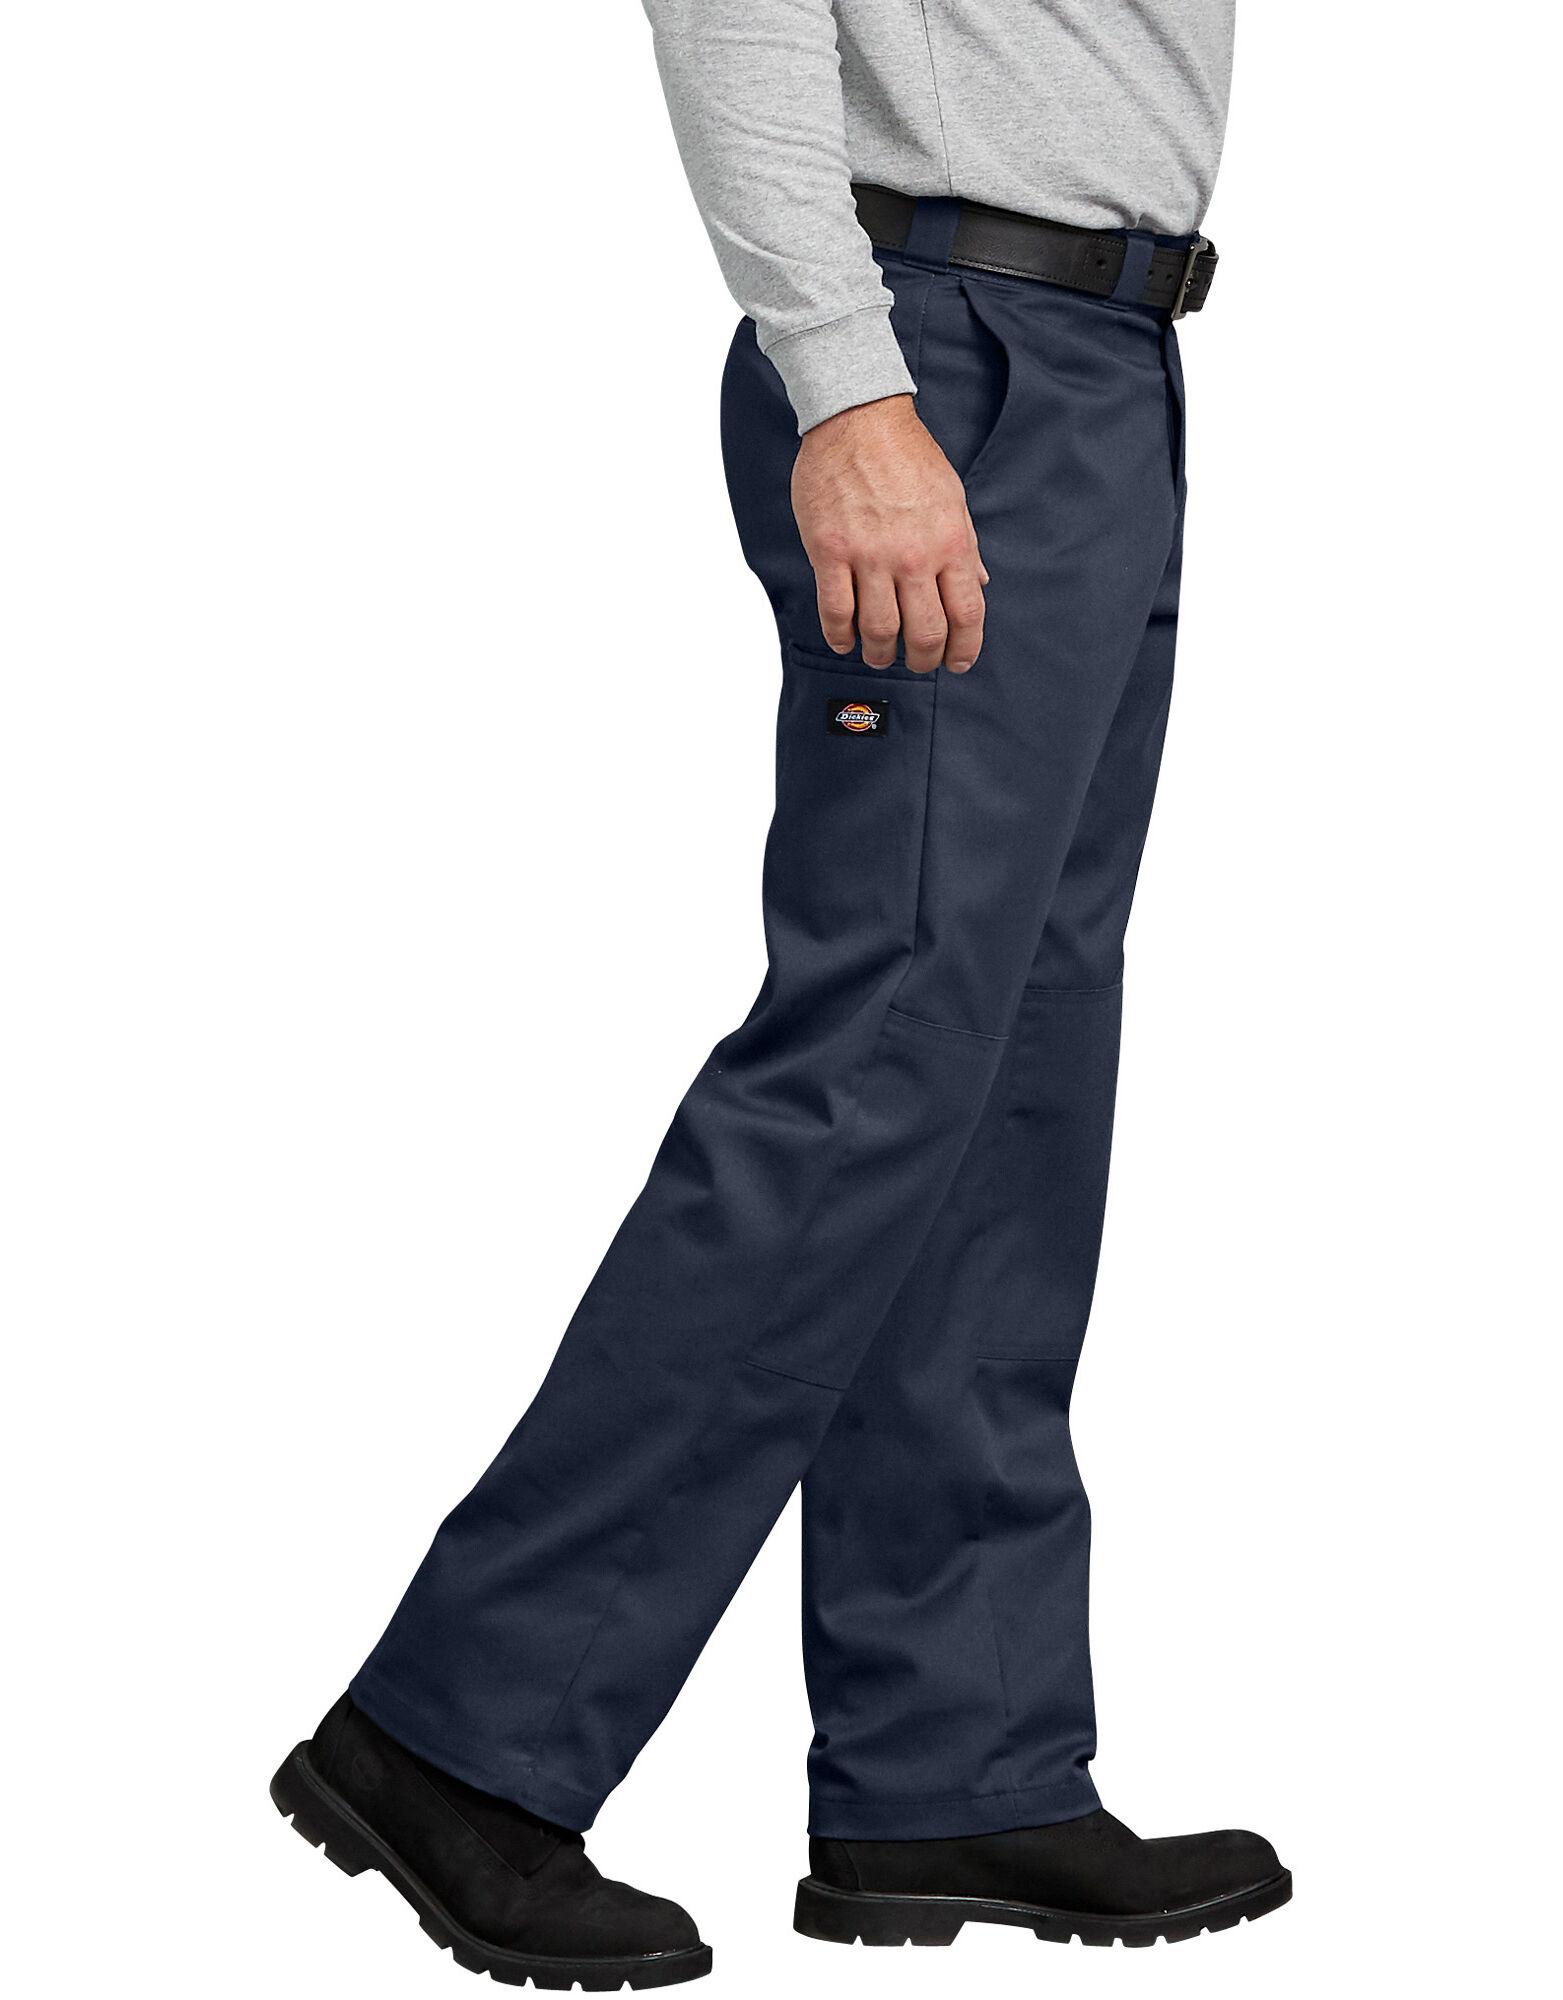 FLEX Regular Fit Straight Leg Double Knee Work Pants-Dickies Canada